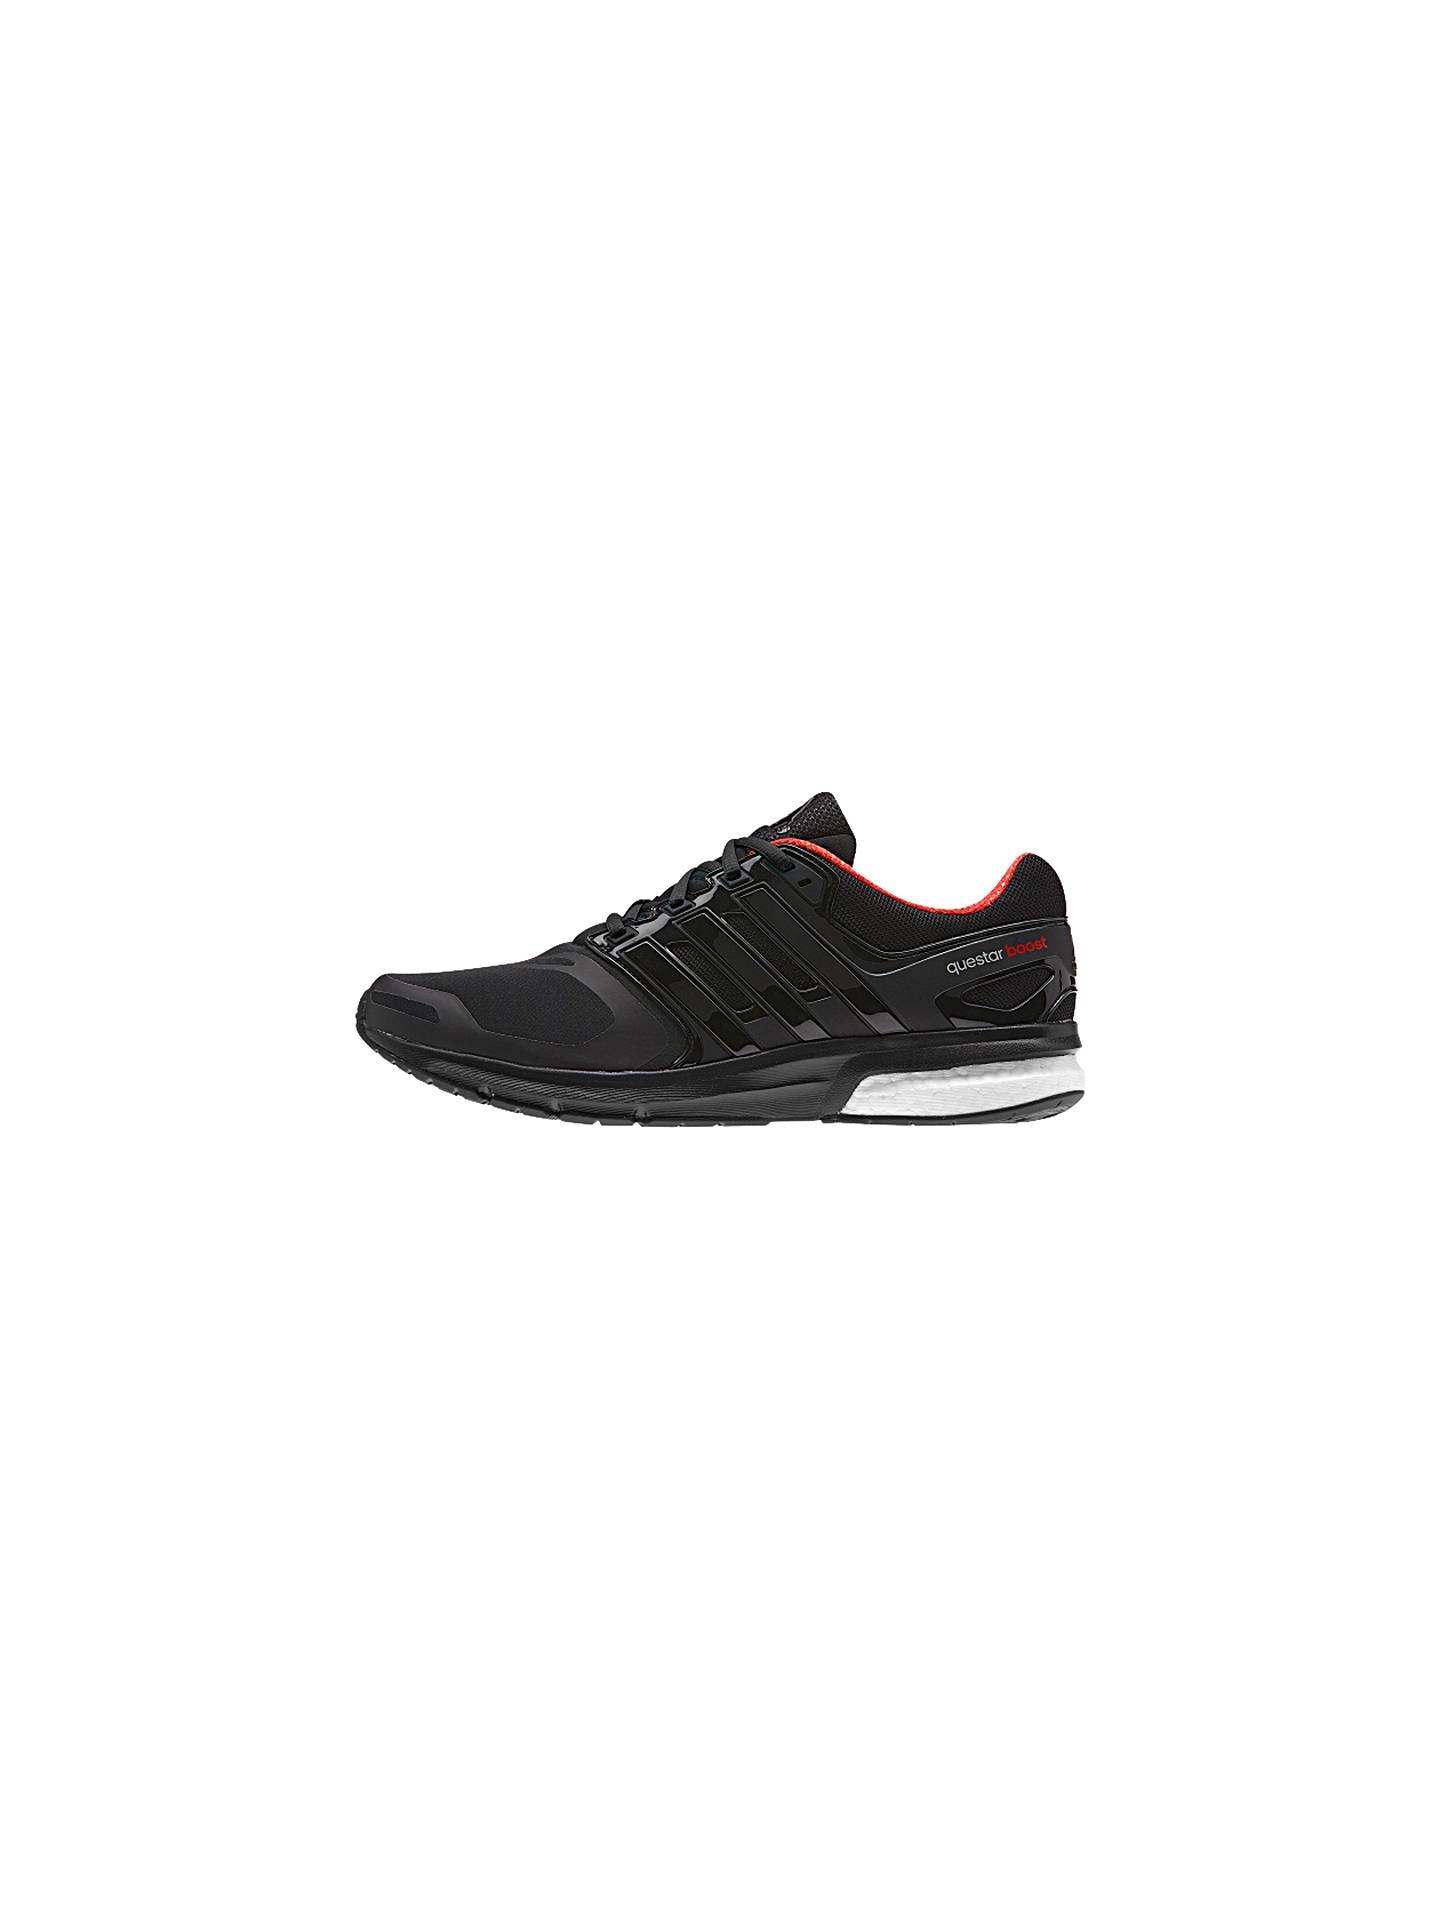 6c54c6184dcc Adidas Questar Boost Techfit Men s Running Shoes at John Lewis ...